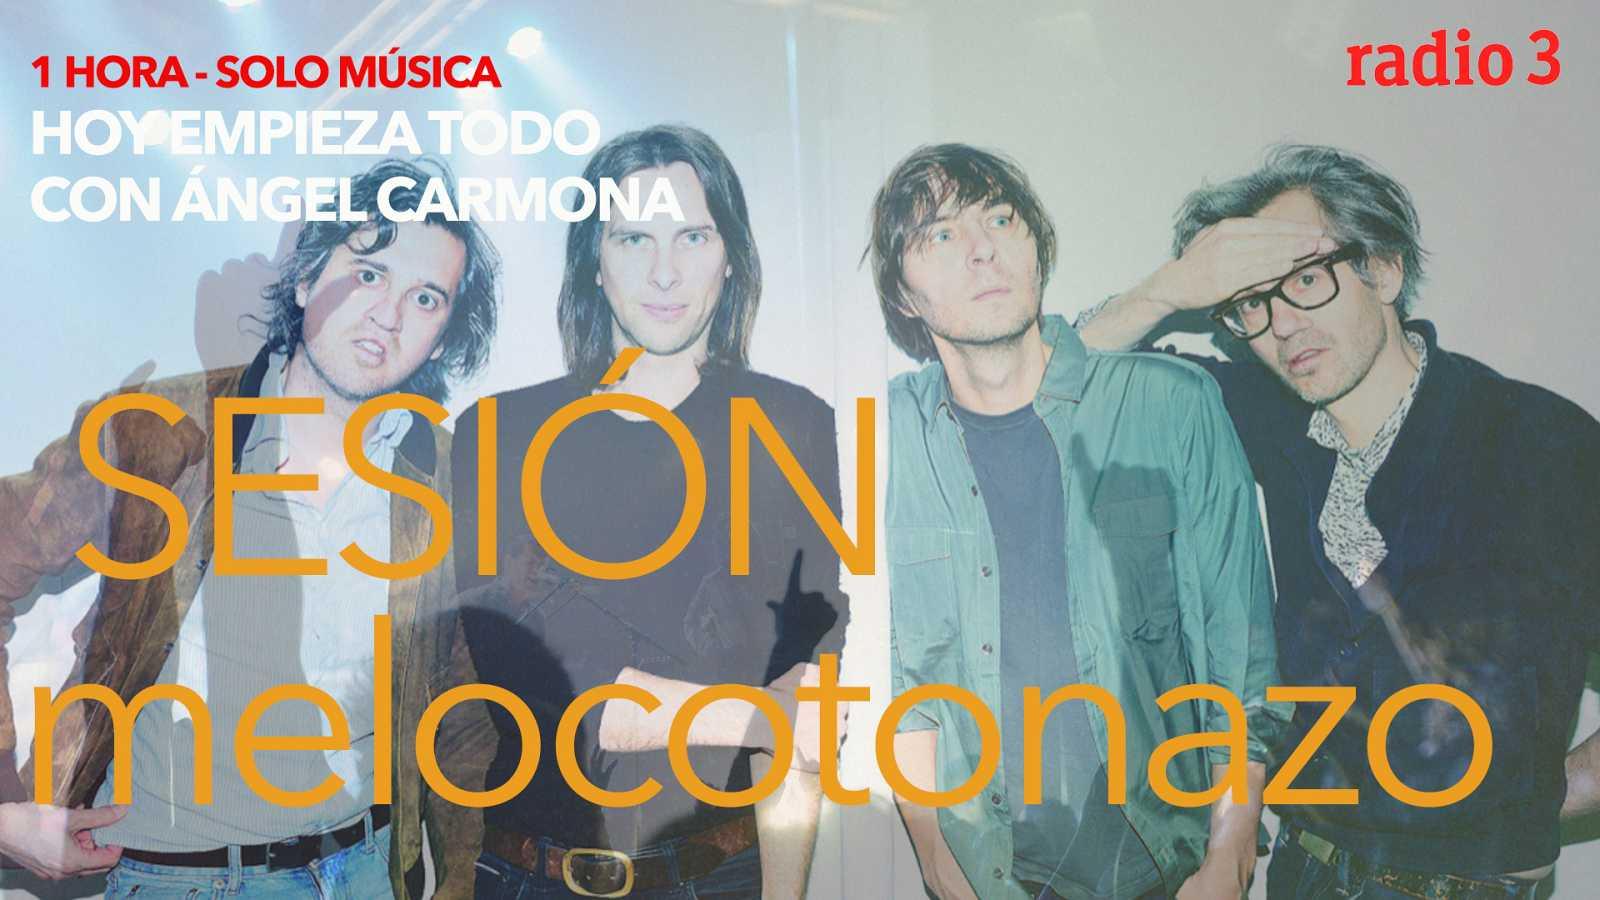 Hoy empieza todo con Ángel Carmona - #SesiónMelocotonazo: RIZAH, Phoenix, Wilco... : 18/01/21 - escuchar ahora